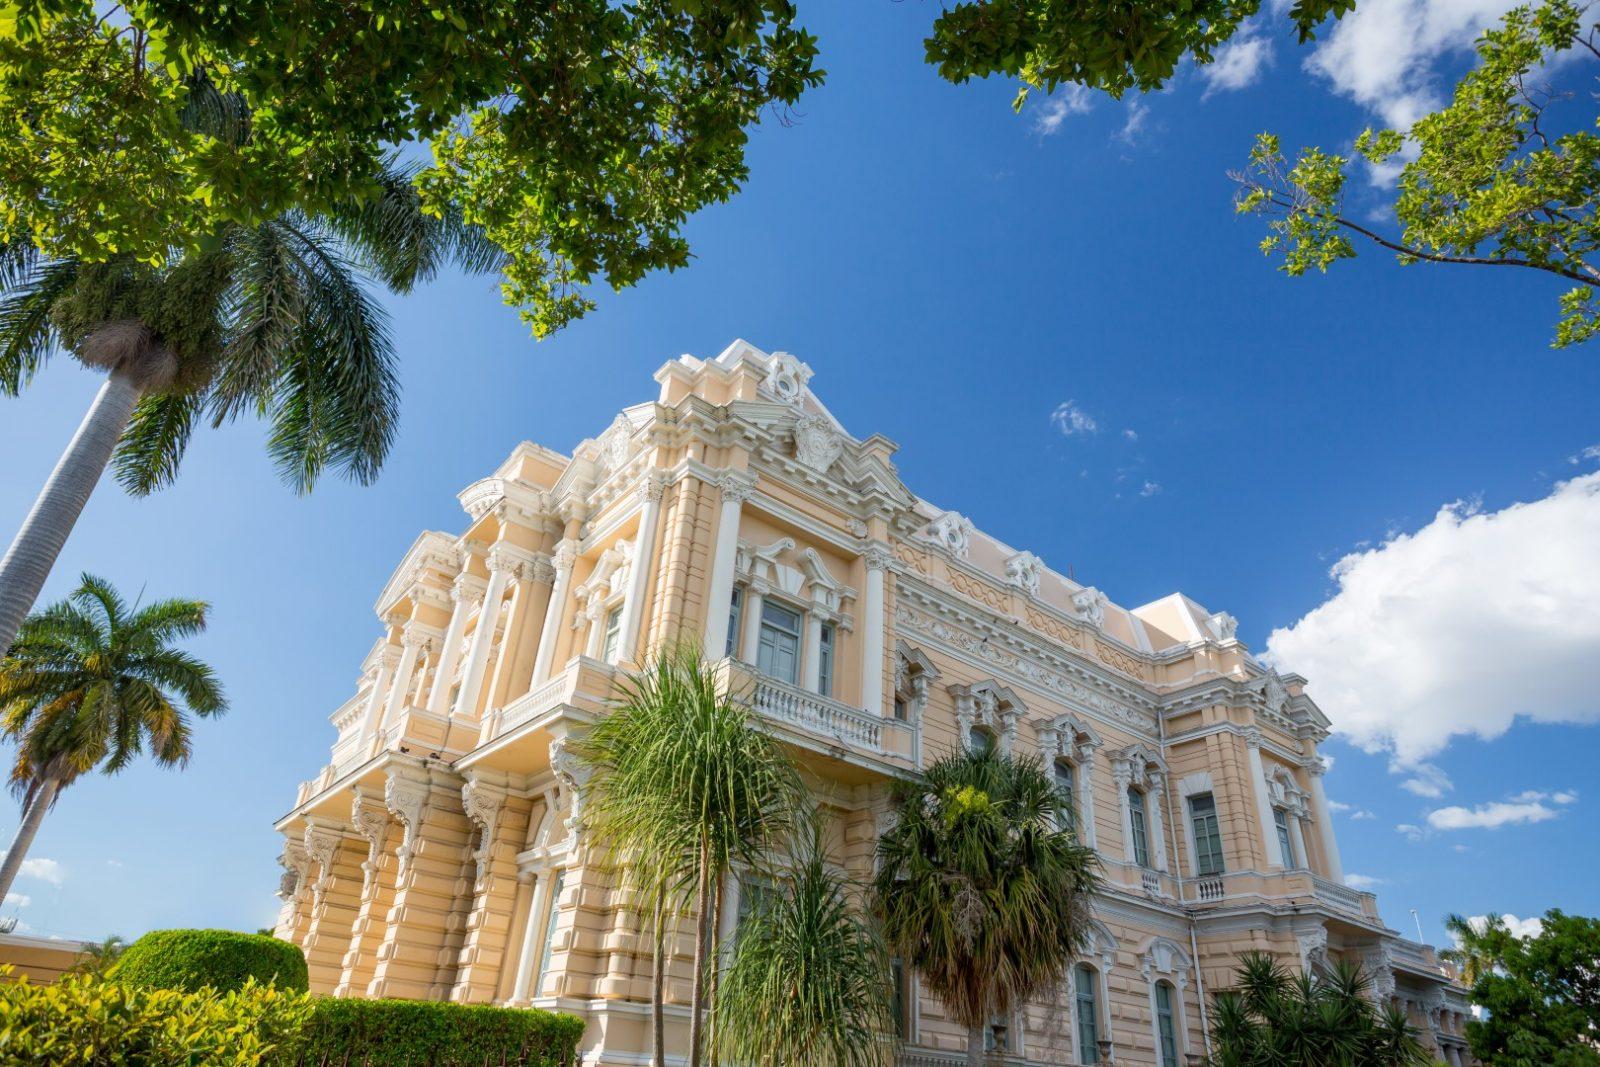 Canton Palace in Merida, Mexico